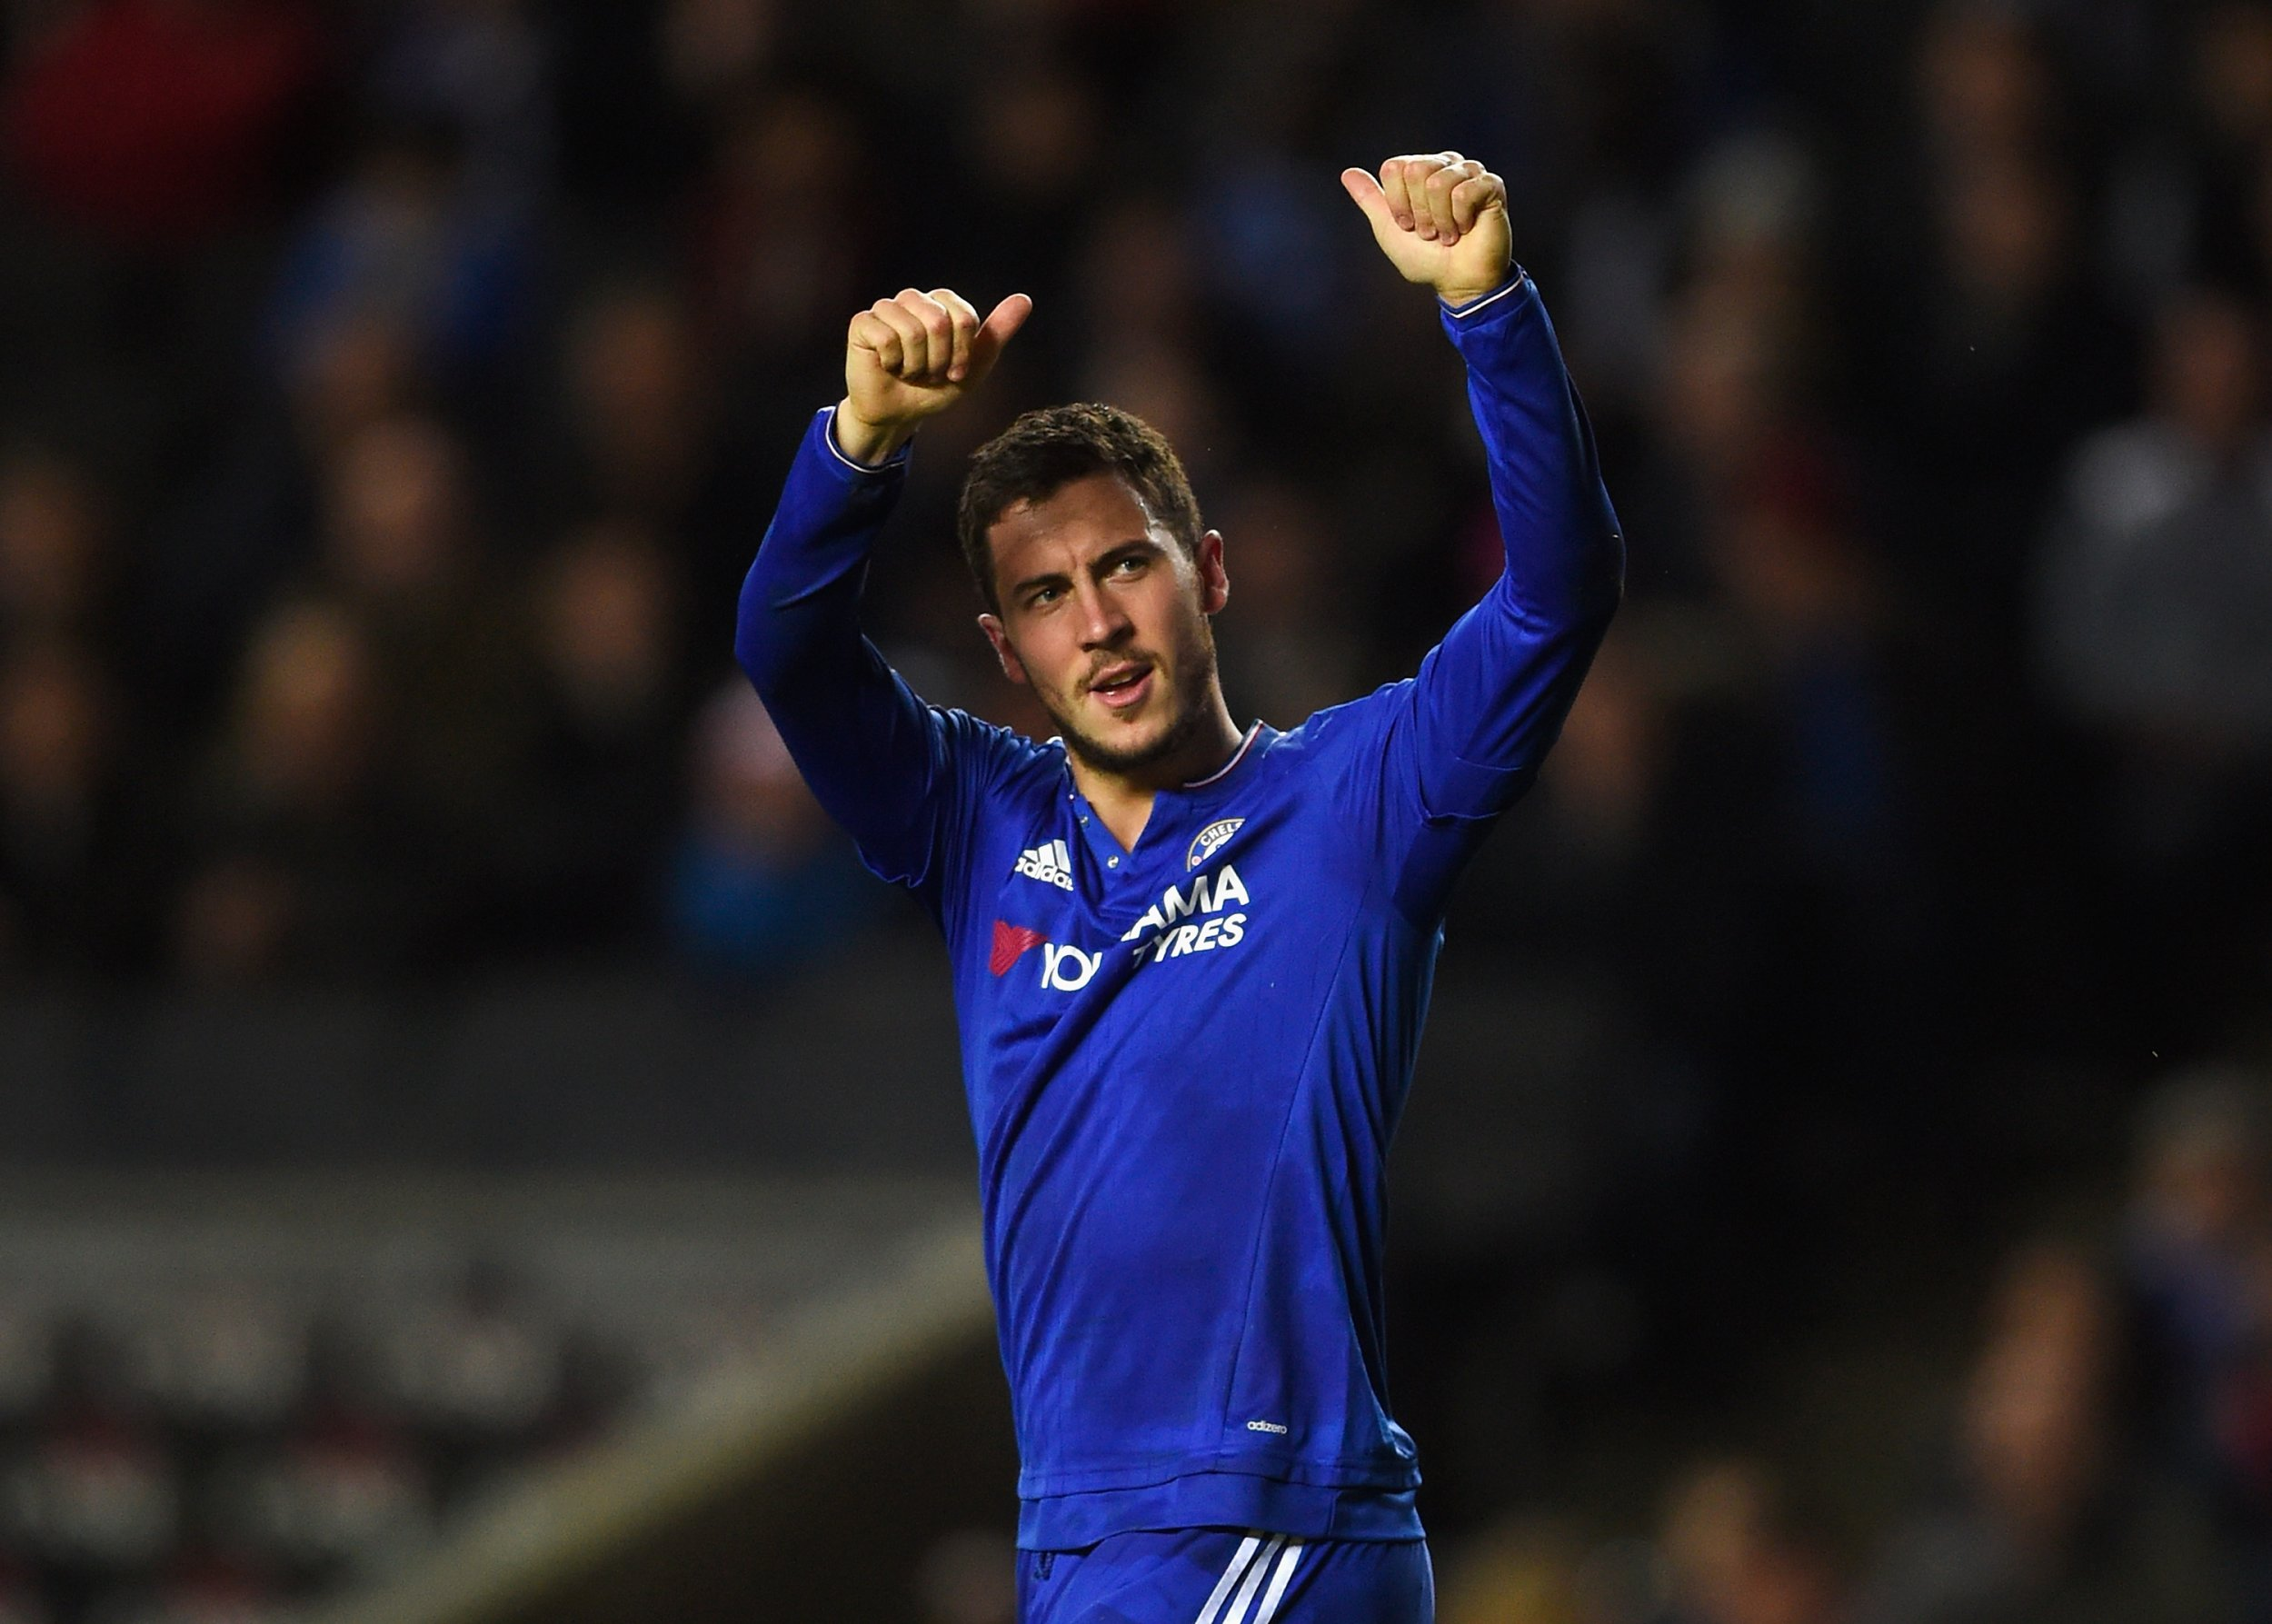 Chelsea's Eden Hazard has failed to replicate the form he showed last season.